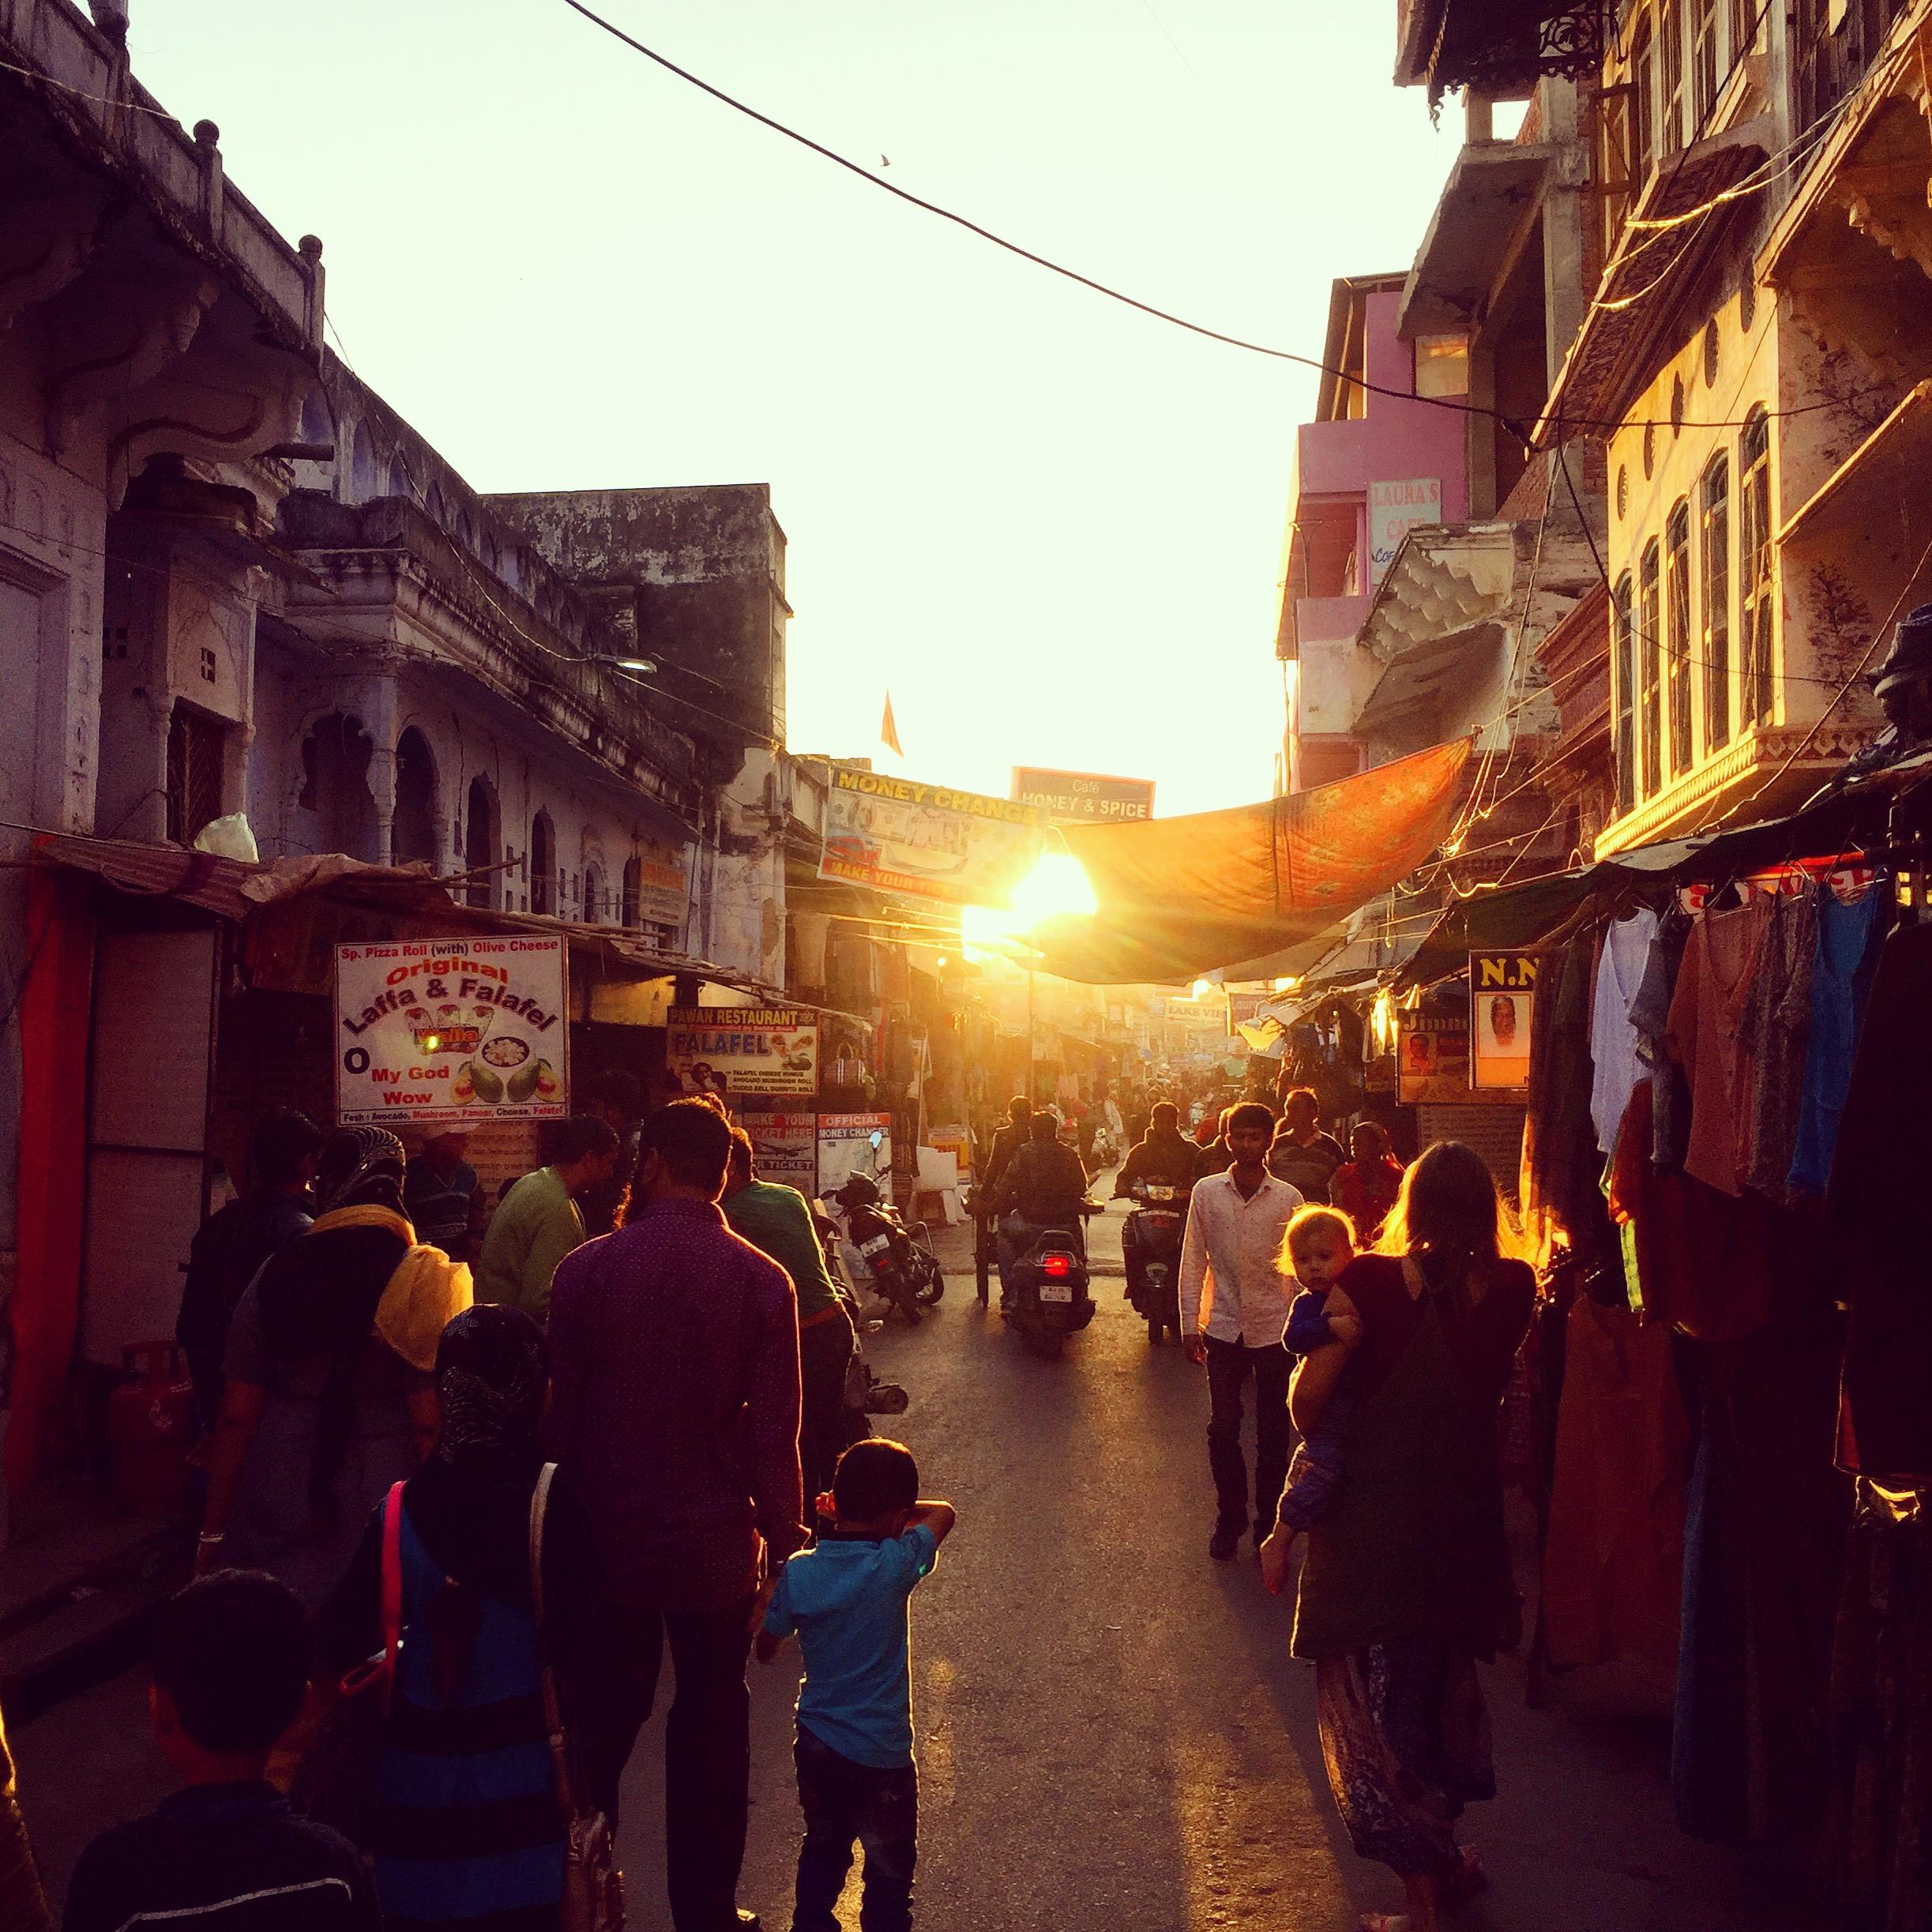 Straßenszene - Sonnenuntergang in Pushkar